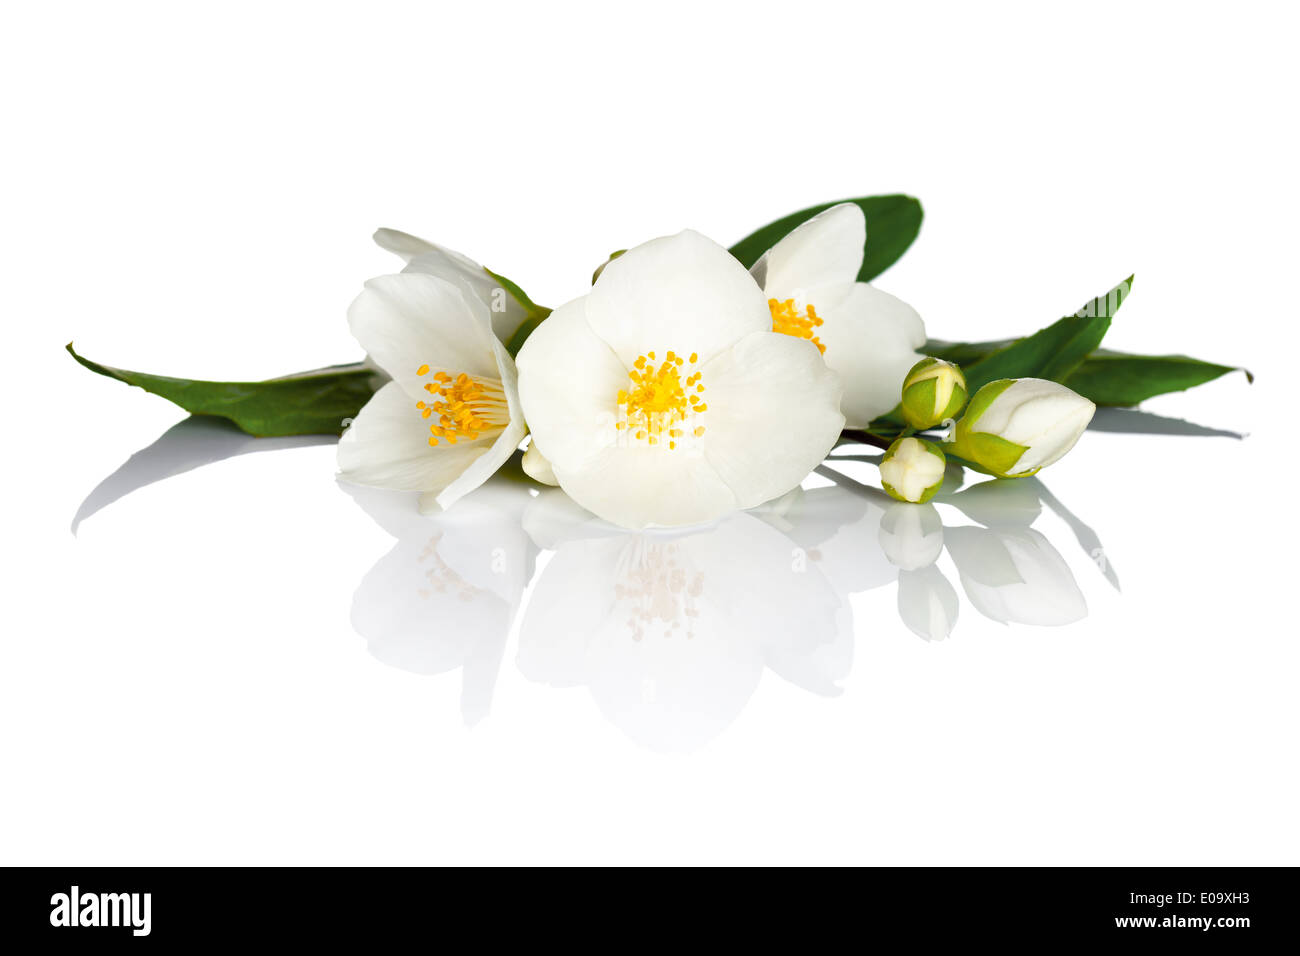 Jasmine flowers with green leaves on white background. Macro shot - Stock Image